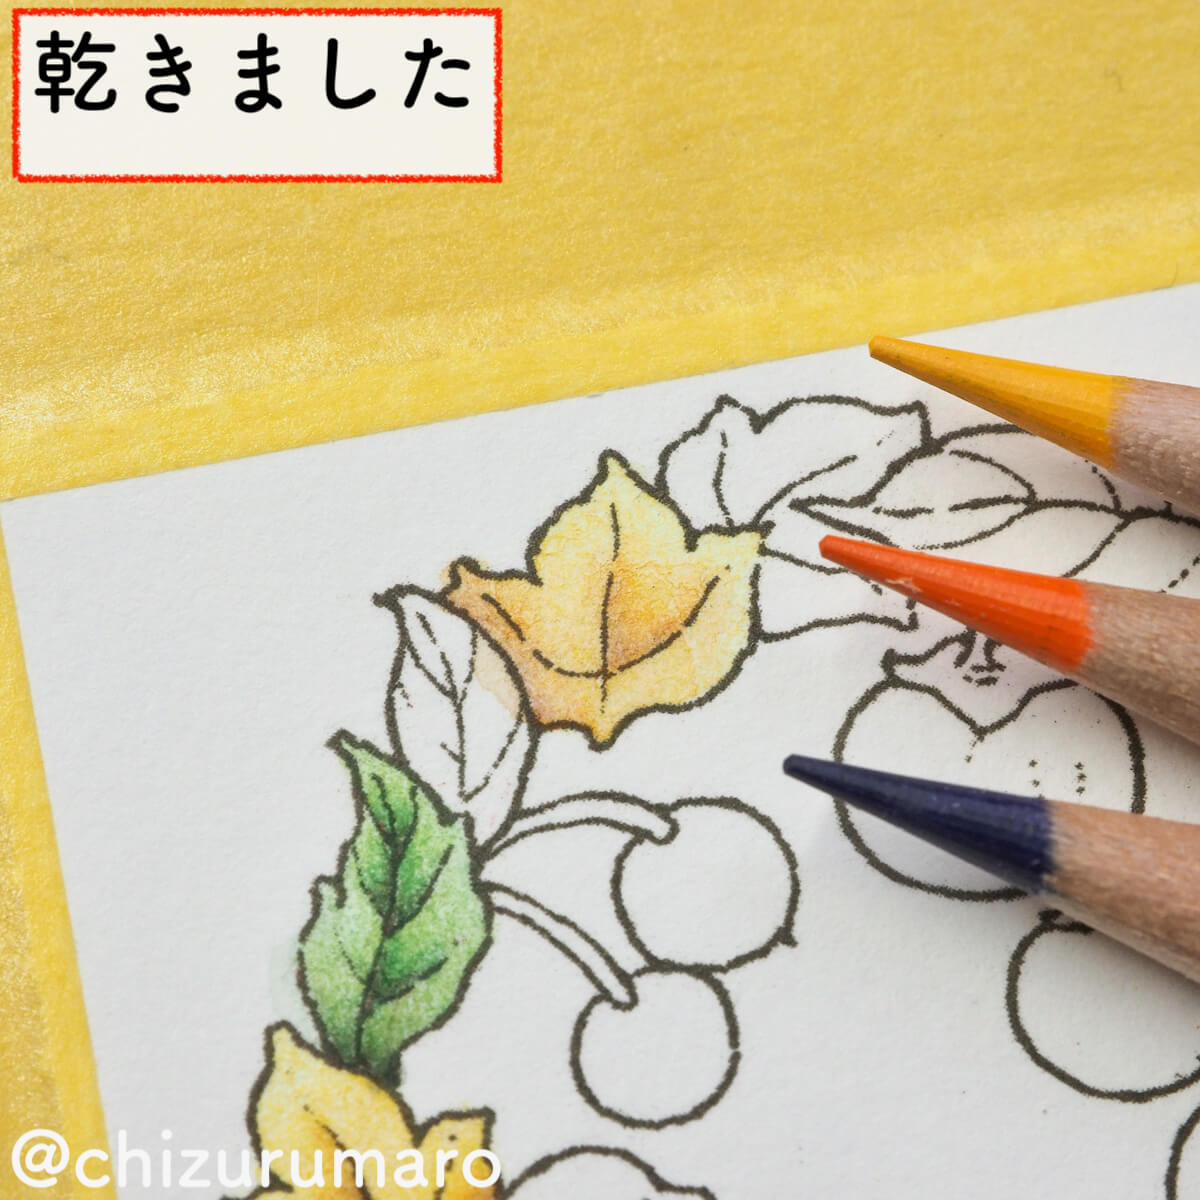 f:id:chizurumaro:20200217143502j:plain